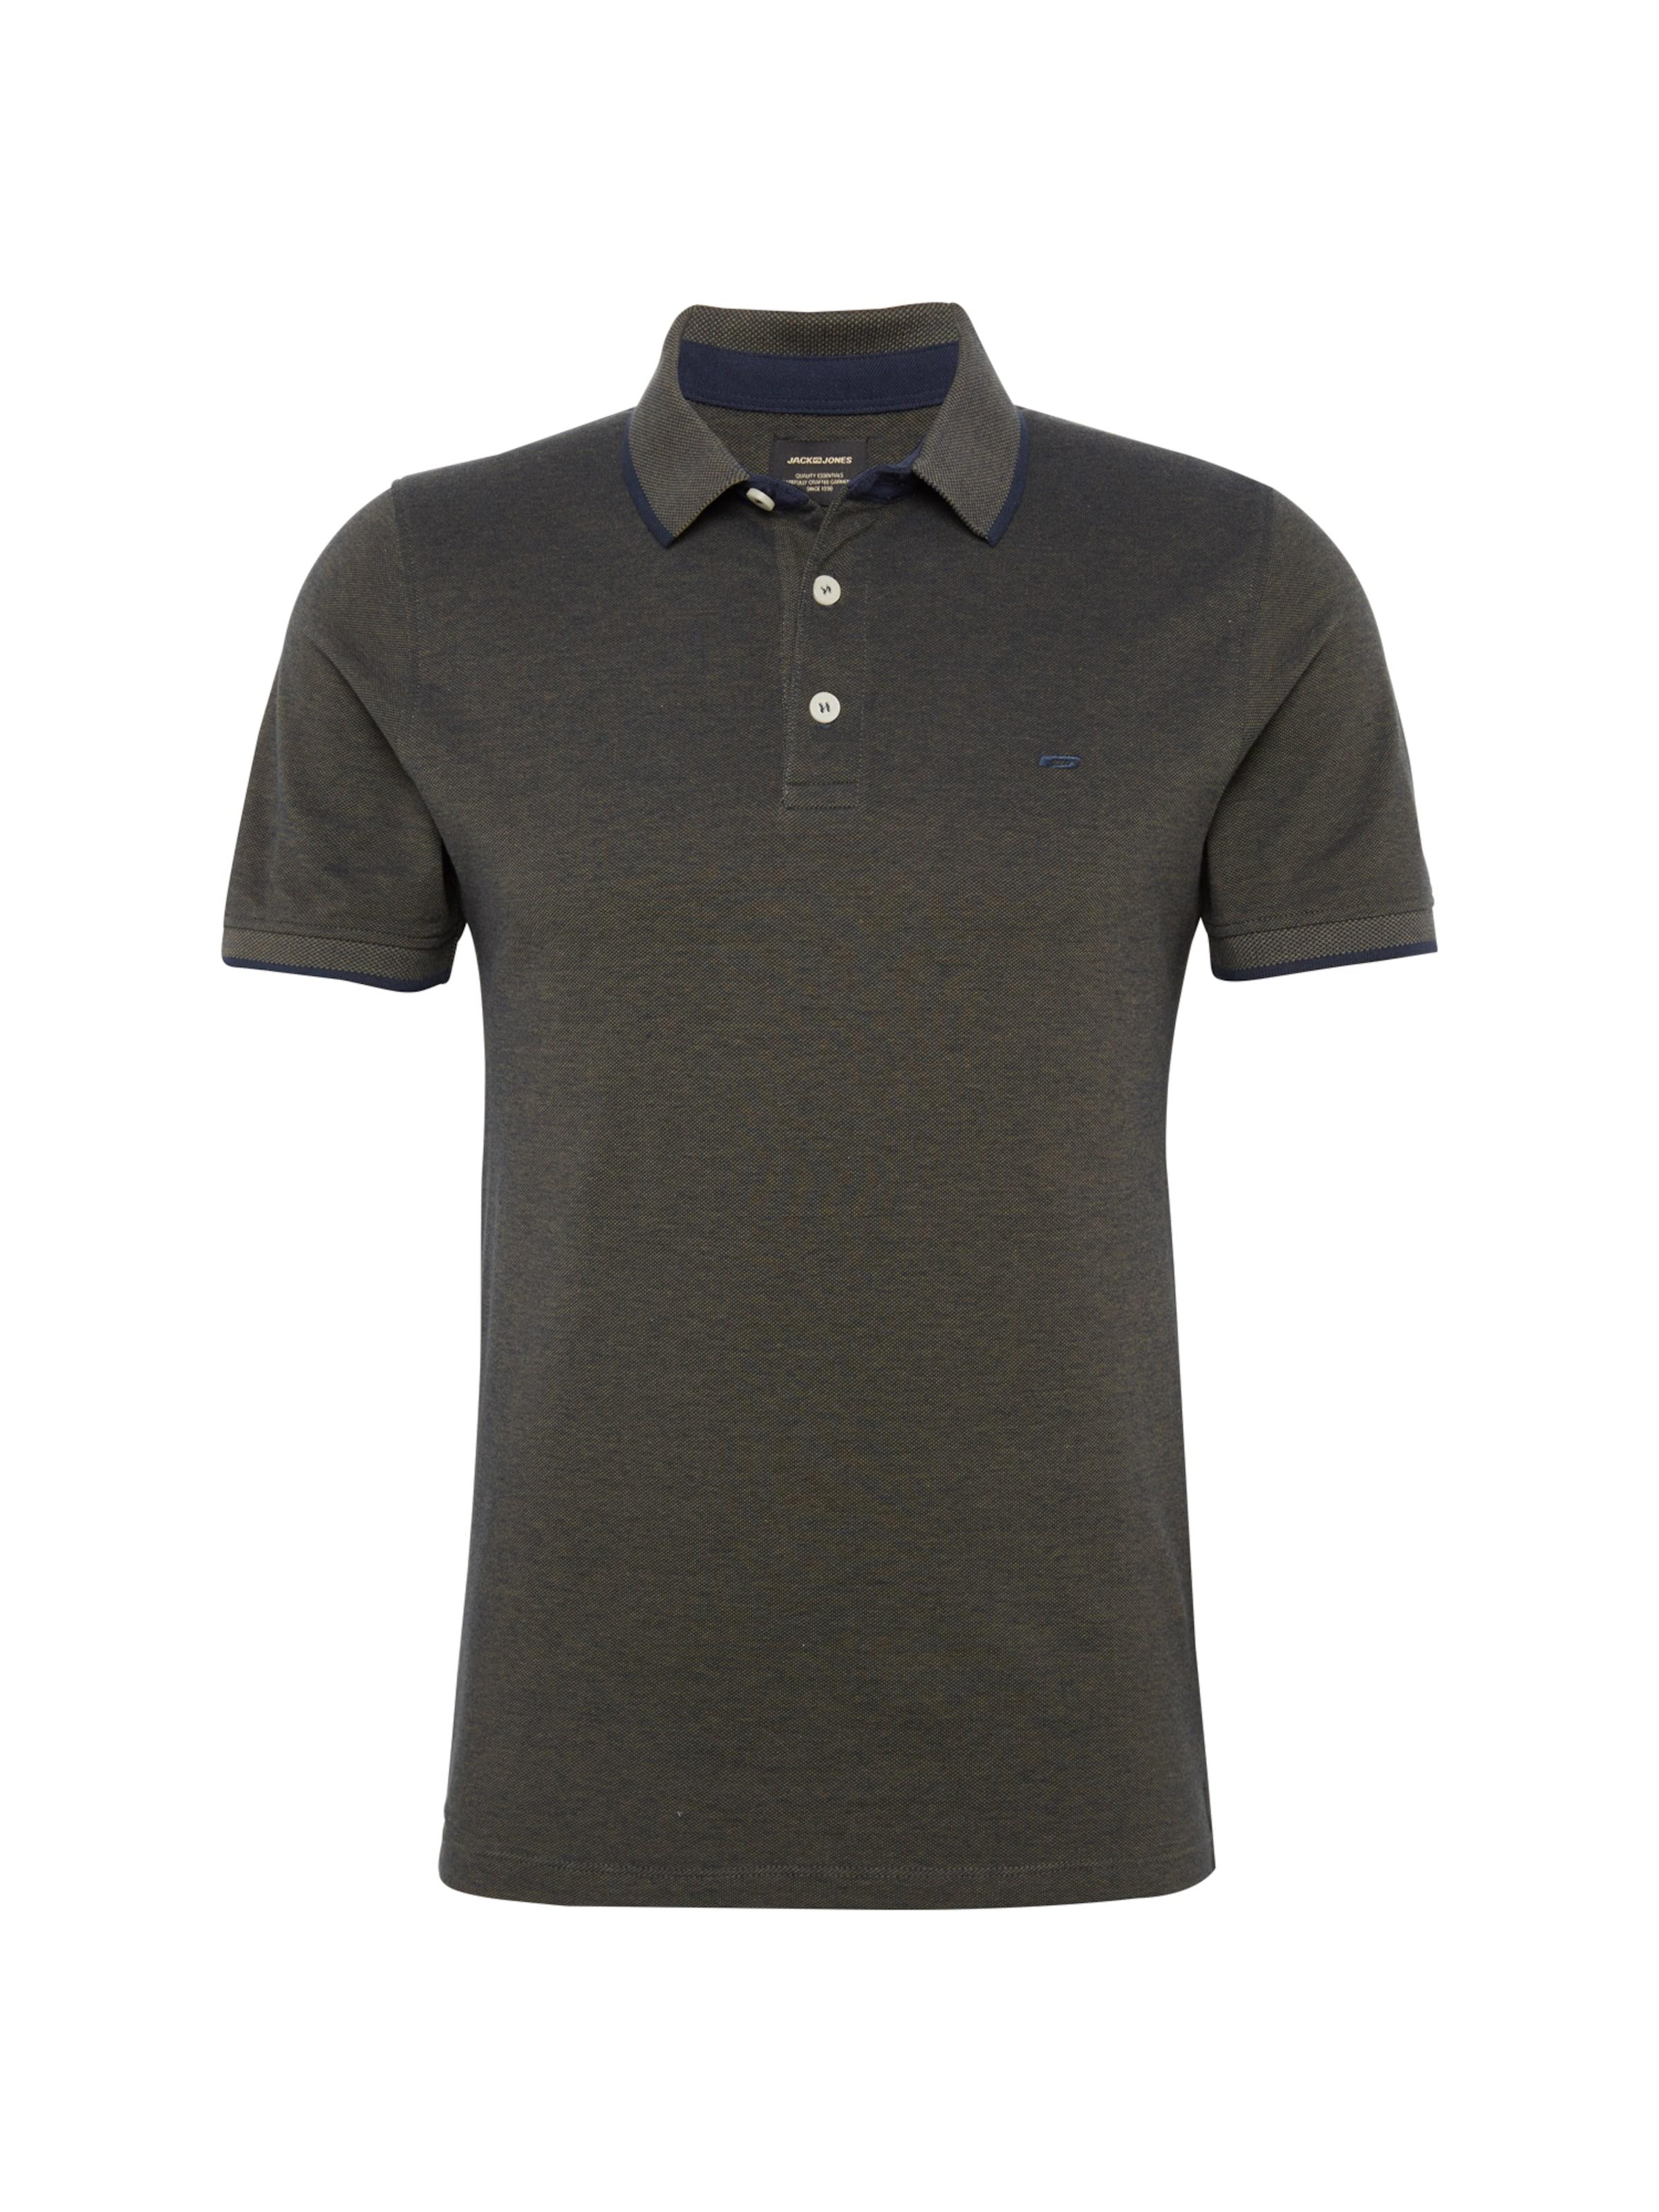 'jjepaulos In Ss' Poloshirt Polo Dunkelgrün Jackamp; Jones NOPZ0k8nwX